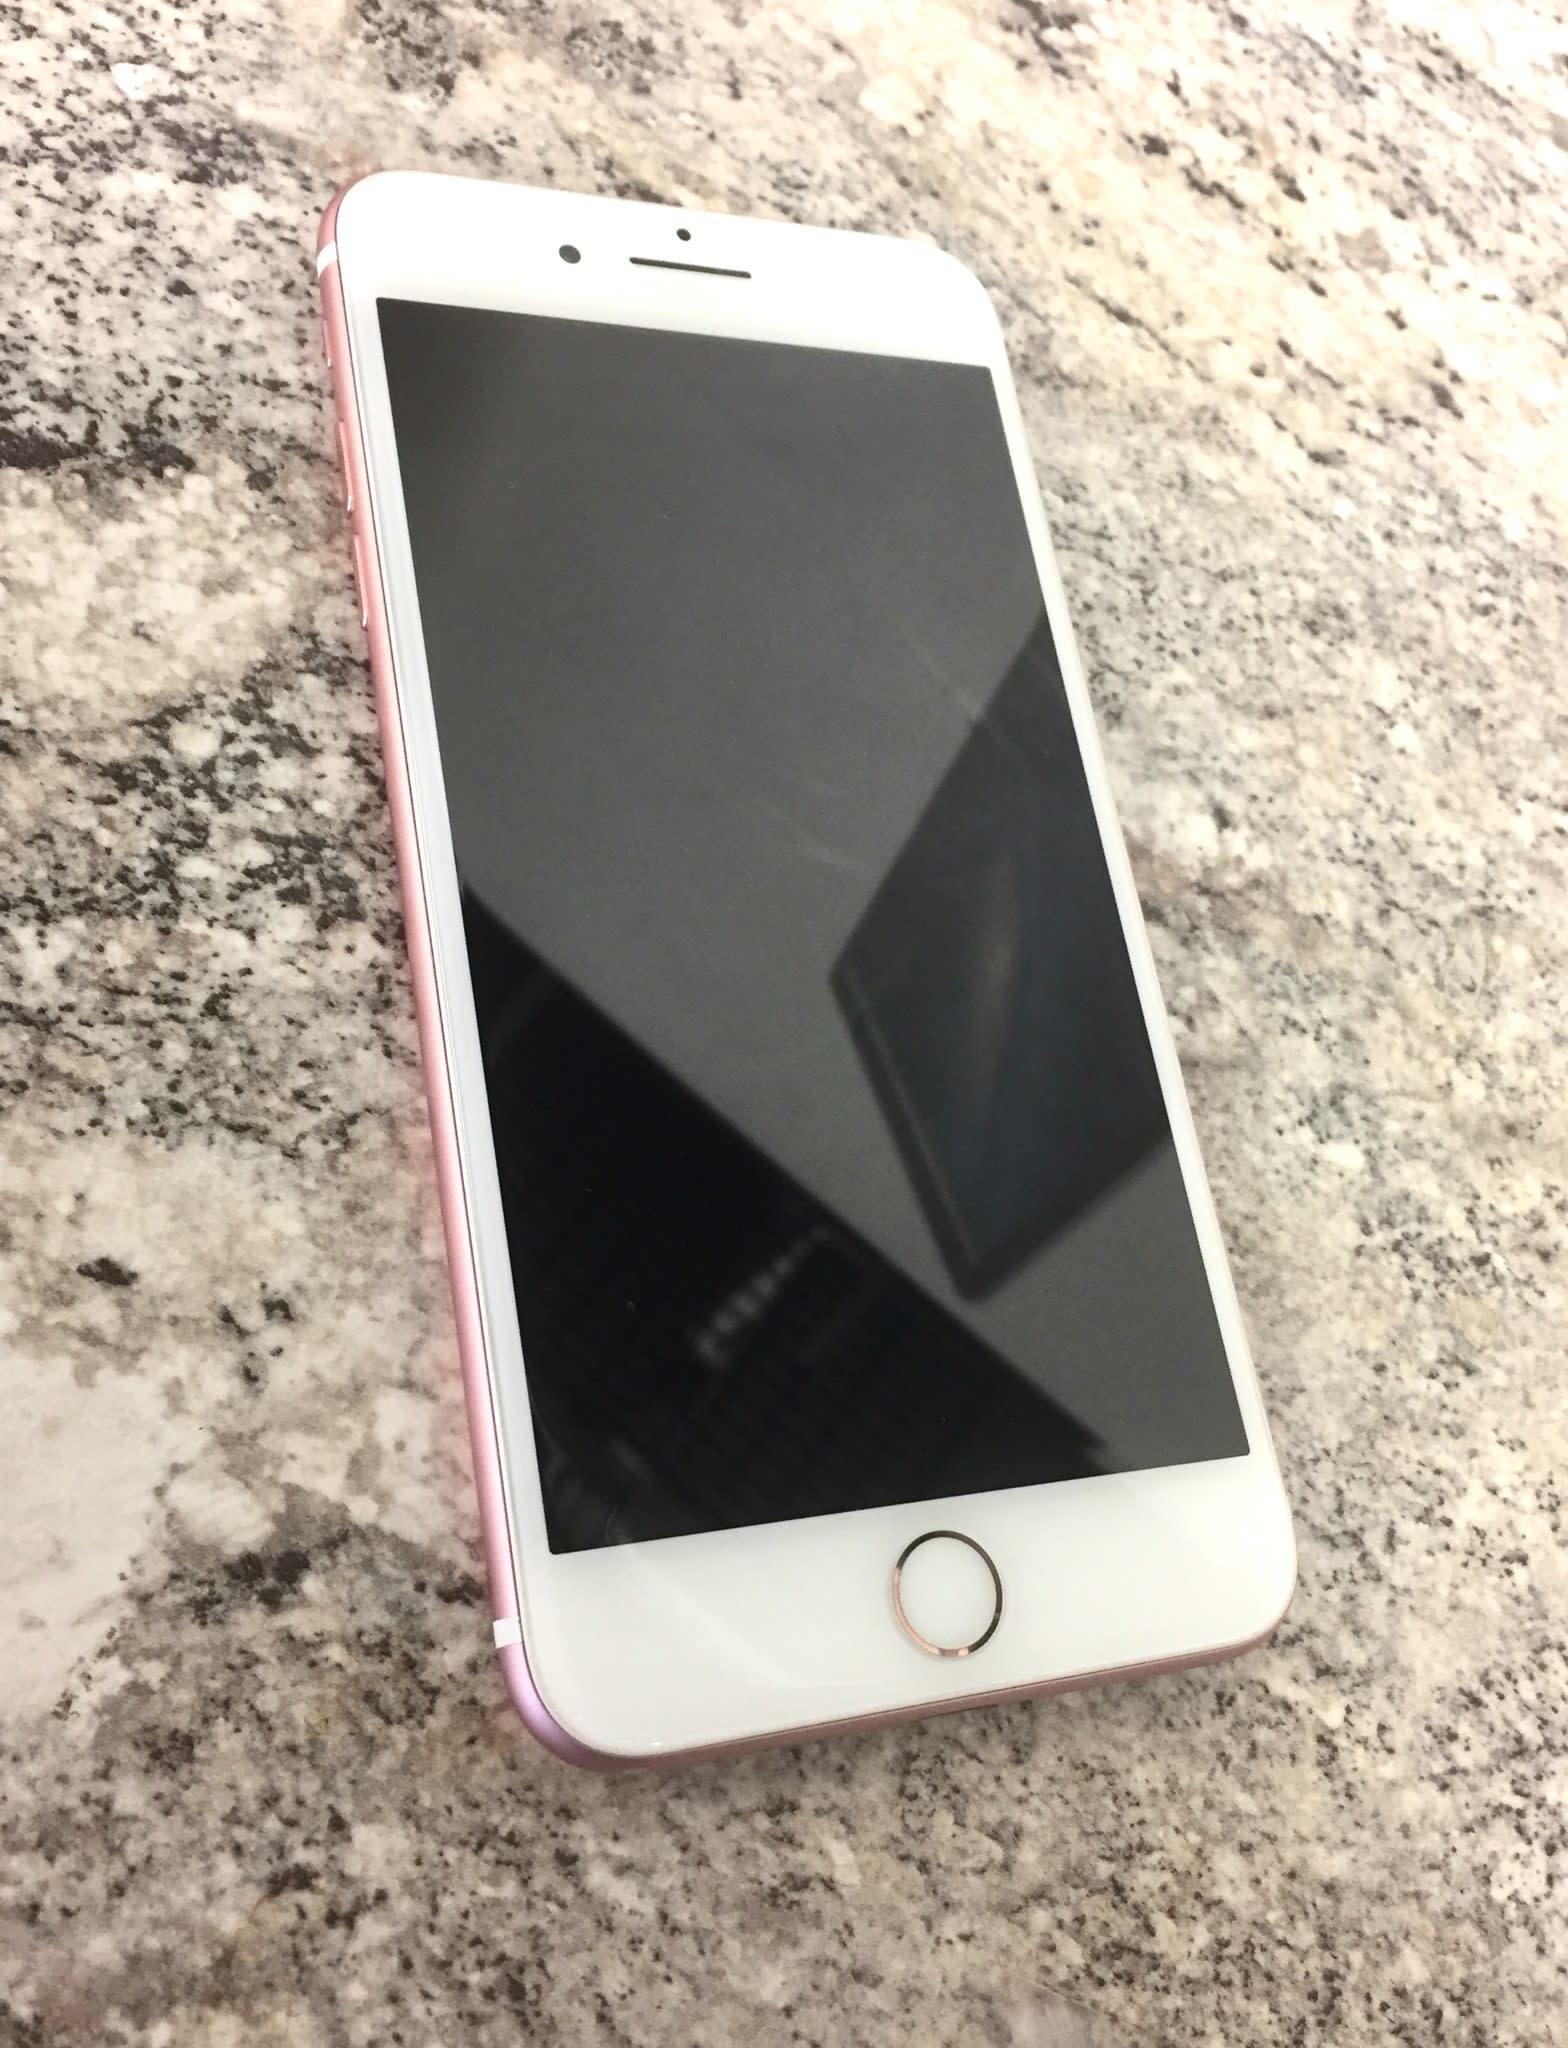 T-Mobile/MetroPCS - iPhone 7 Plus - 32GB - Rose Gold